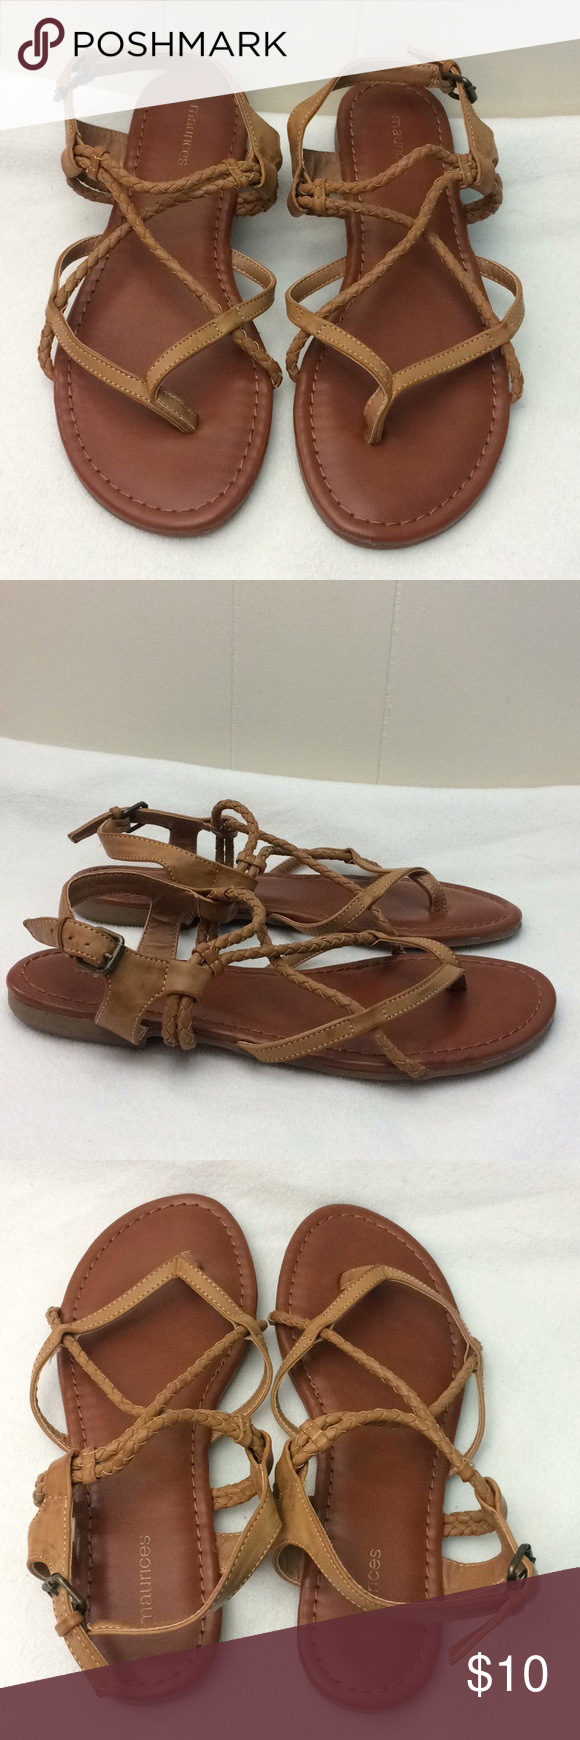 "b418cd1ab777d9 Maurices ""Adalie"" Braided Strap Sandals Maurices ""Adalie"" braided strap  sandals. All"